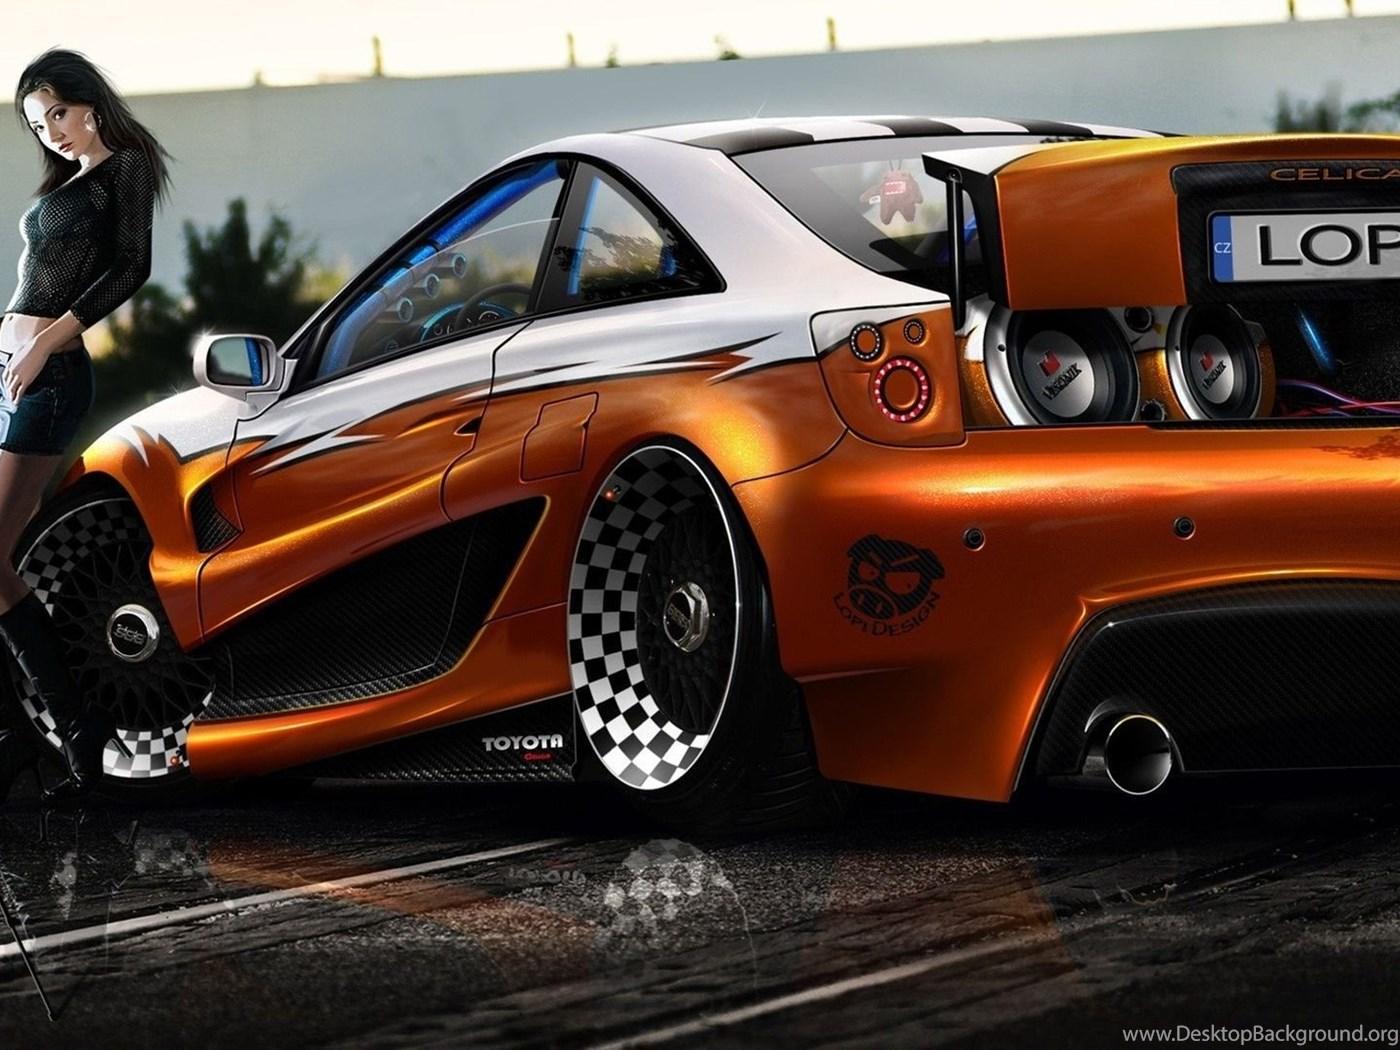 64 Cars Wallpapers Hd Full Hd 1080p Desktop Backgrounds